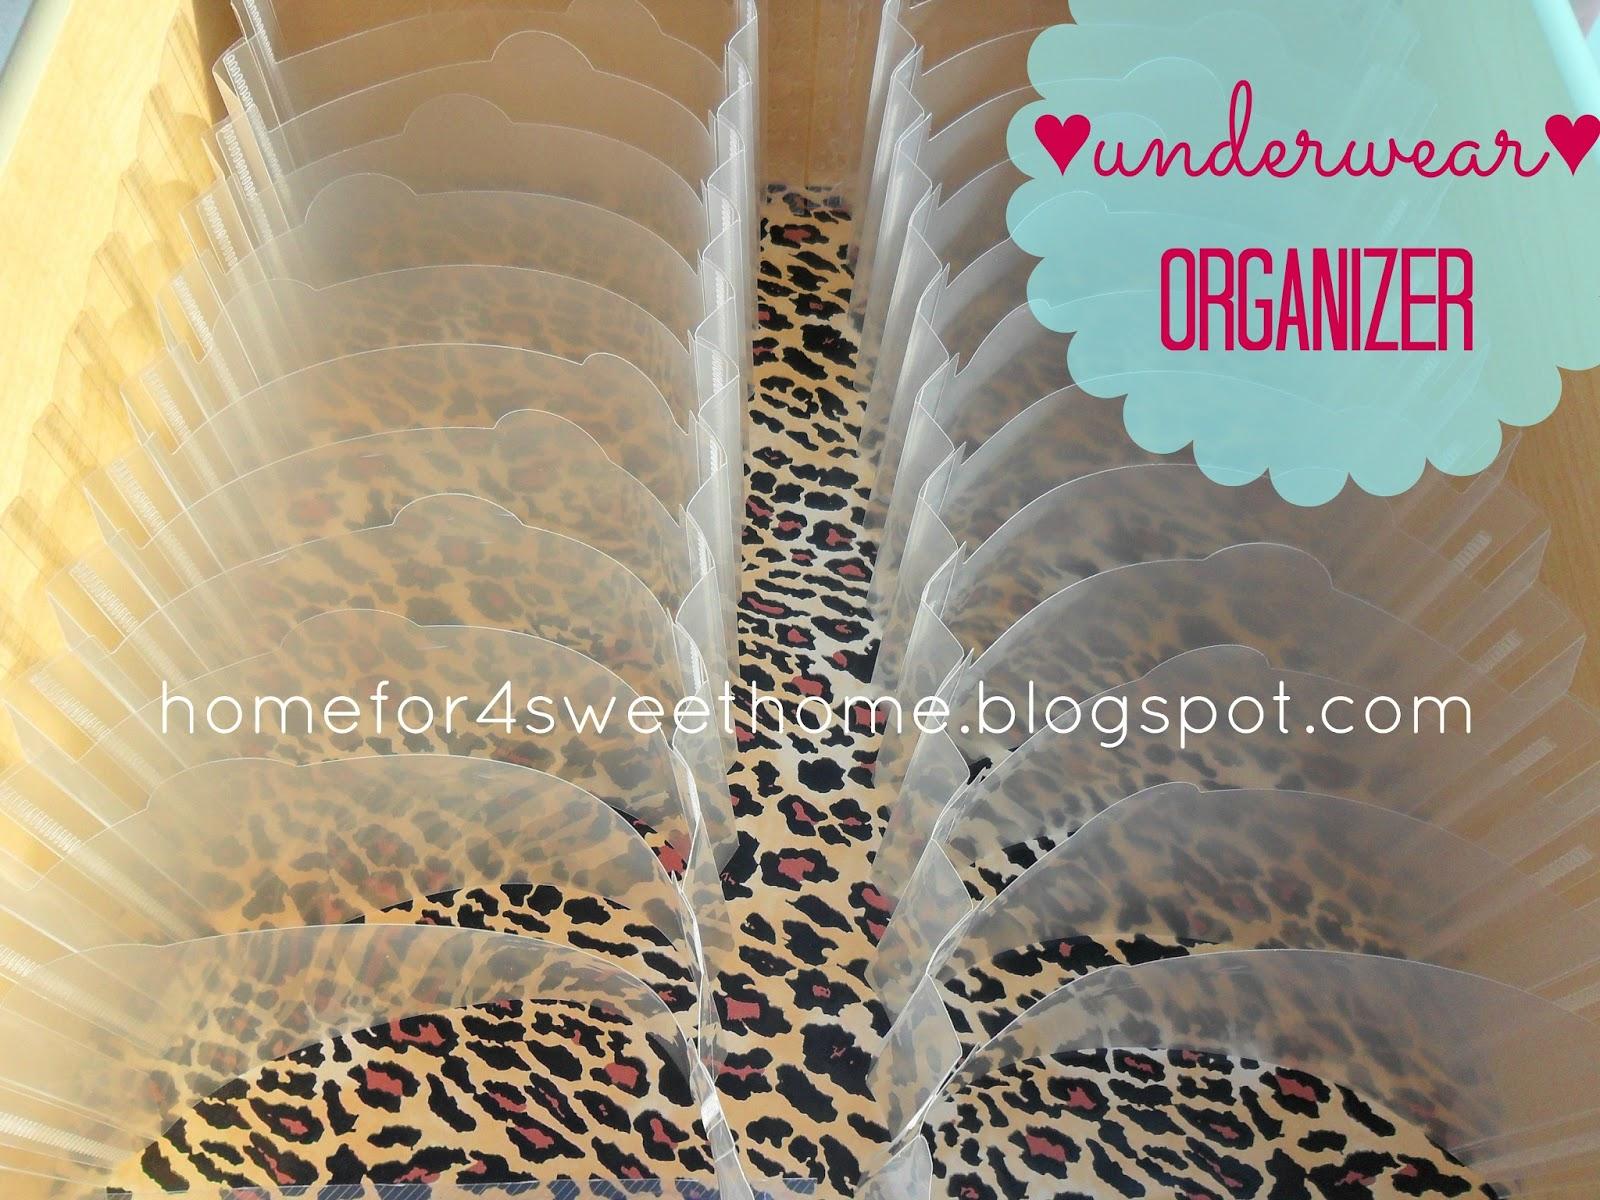 organizing panty, underwear organization